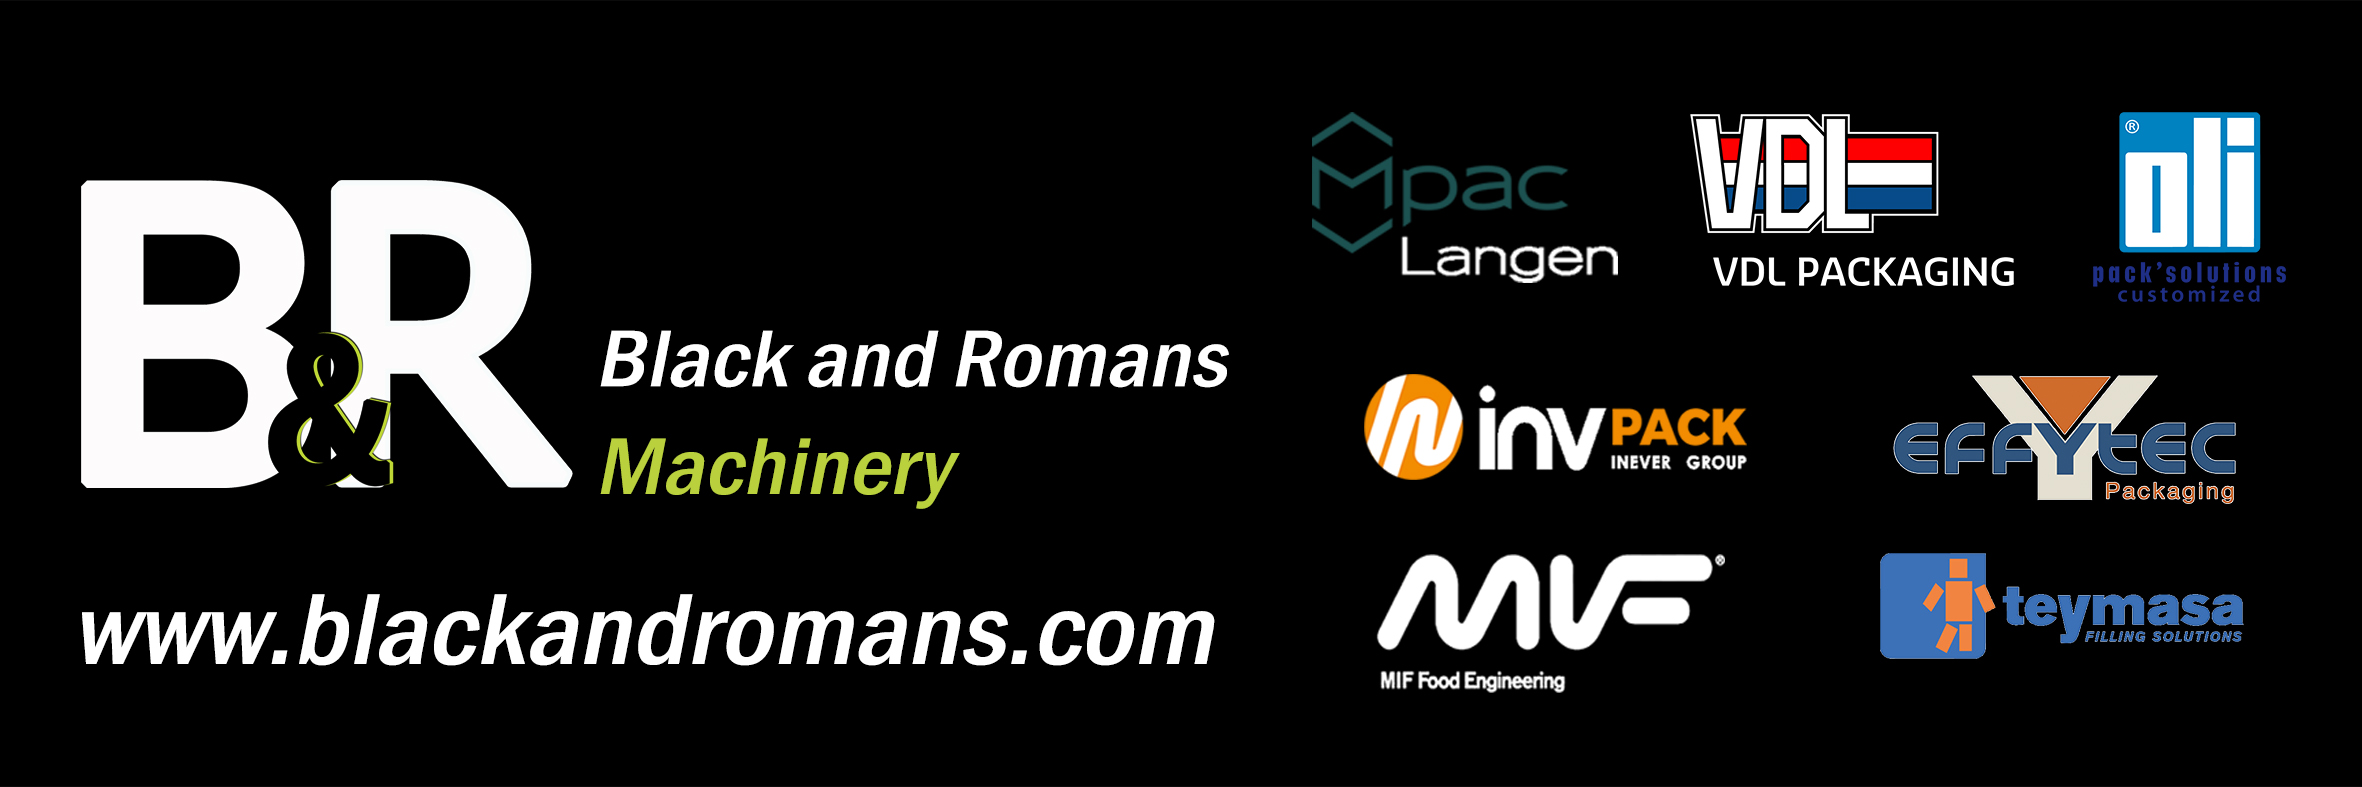 Black and Romans Machinery